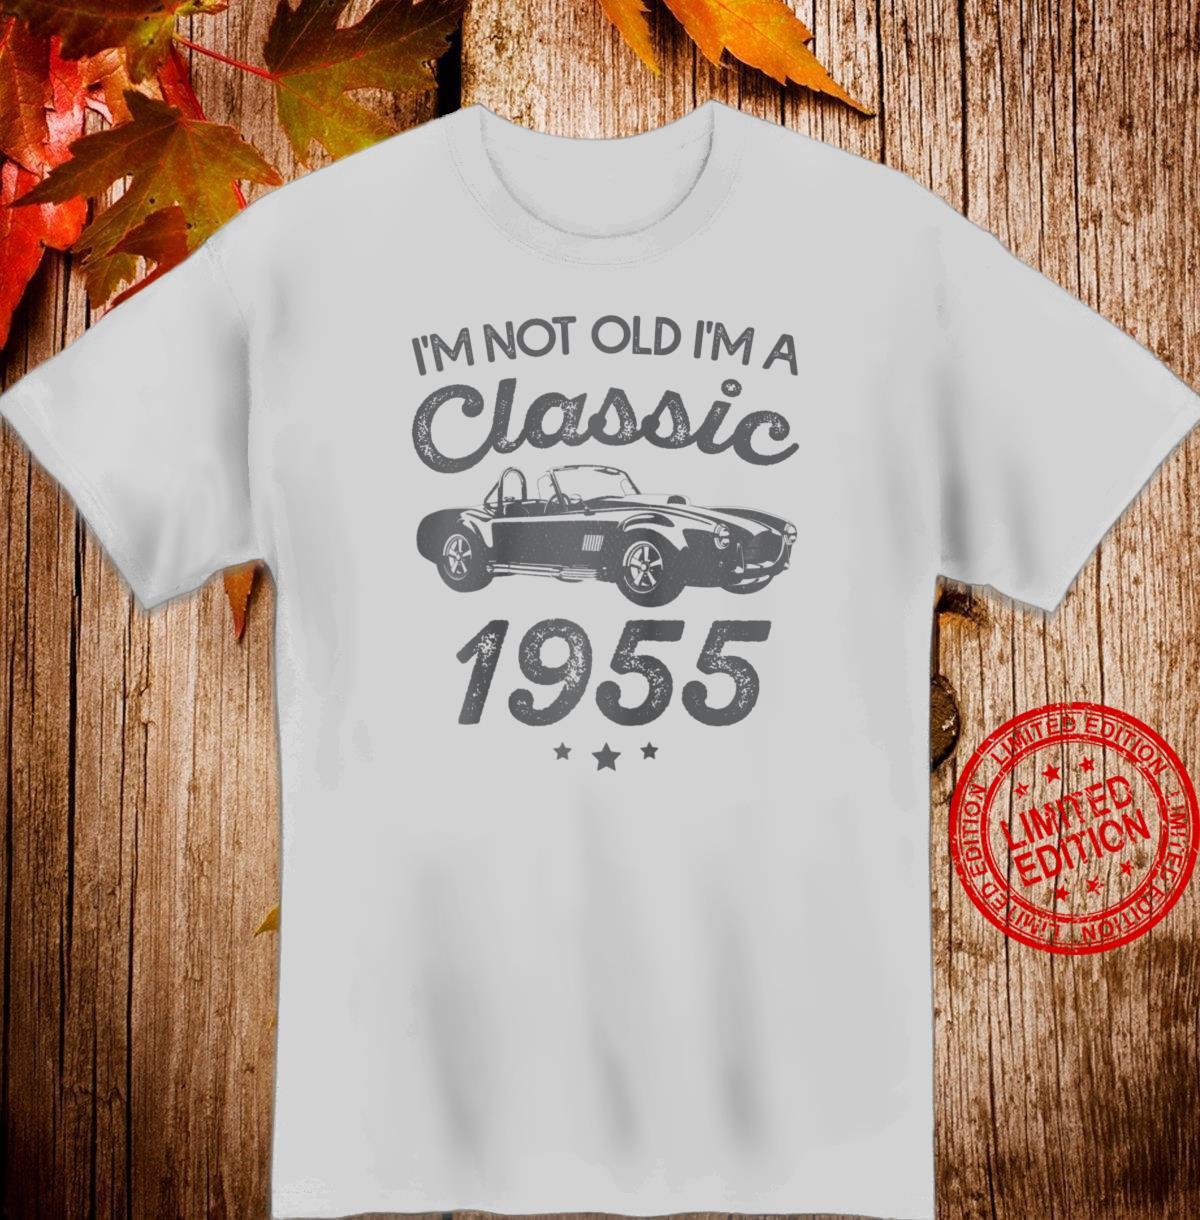 I'm Not Old I'm Classic Car Birthday 1955 Shirt